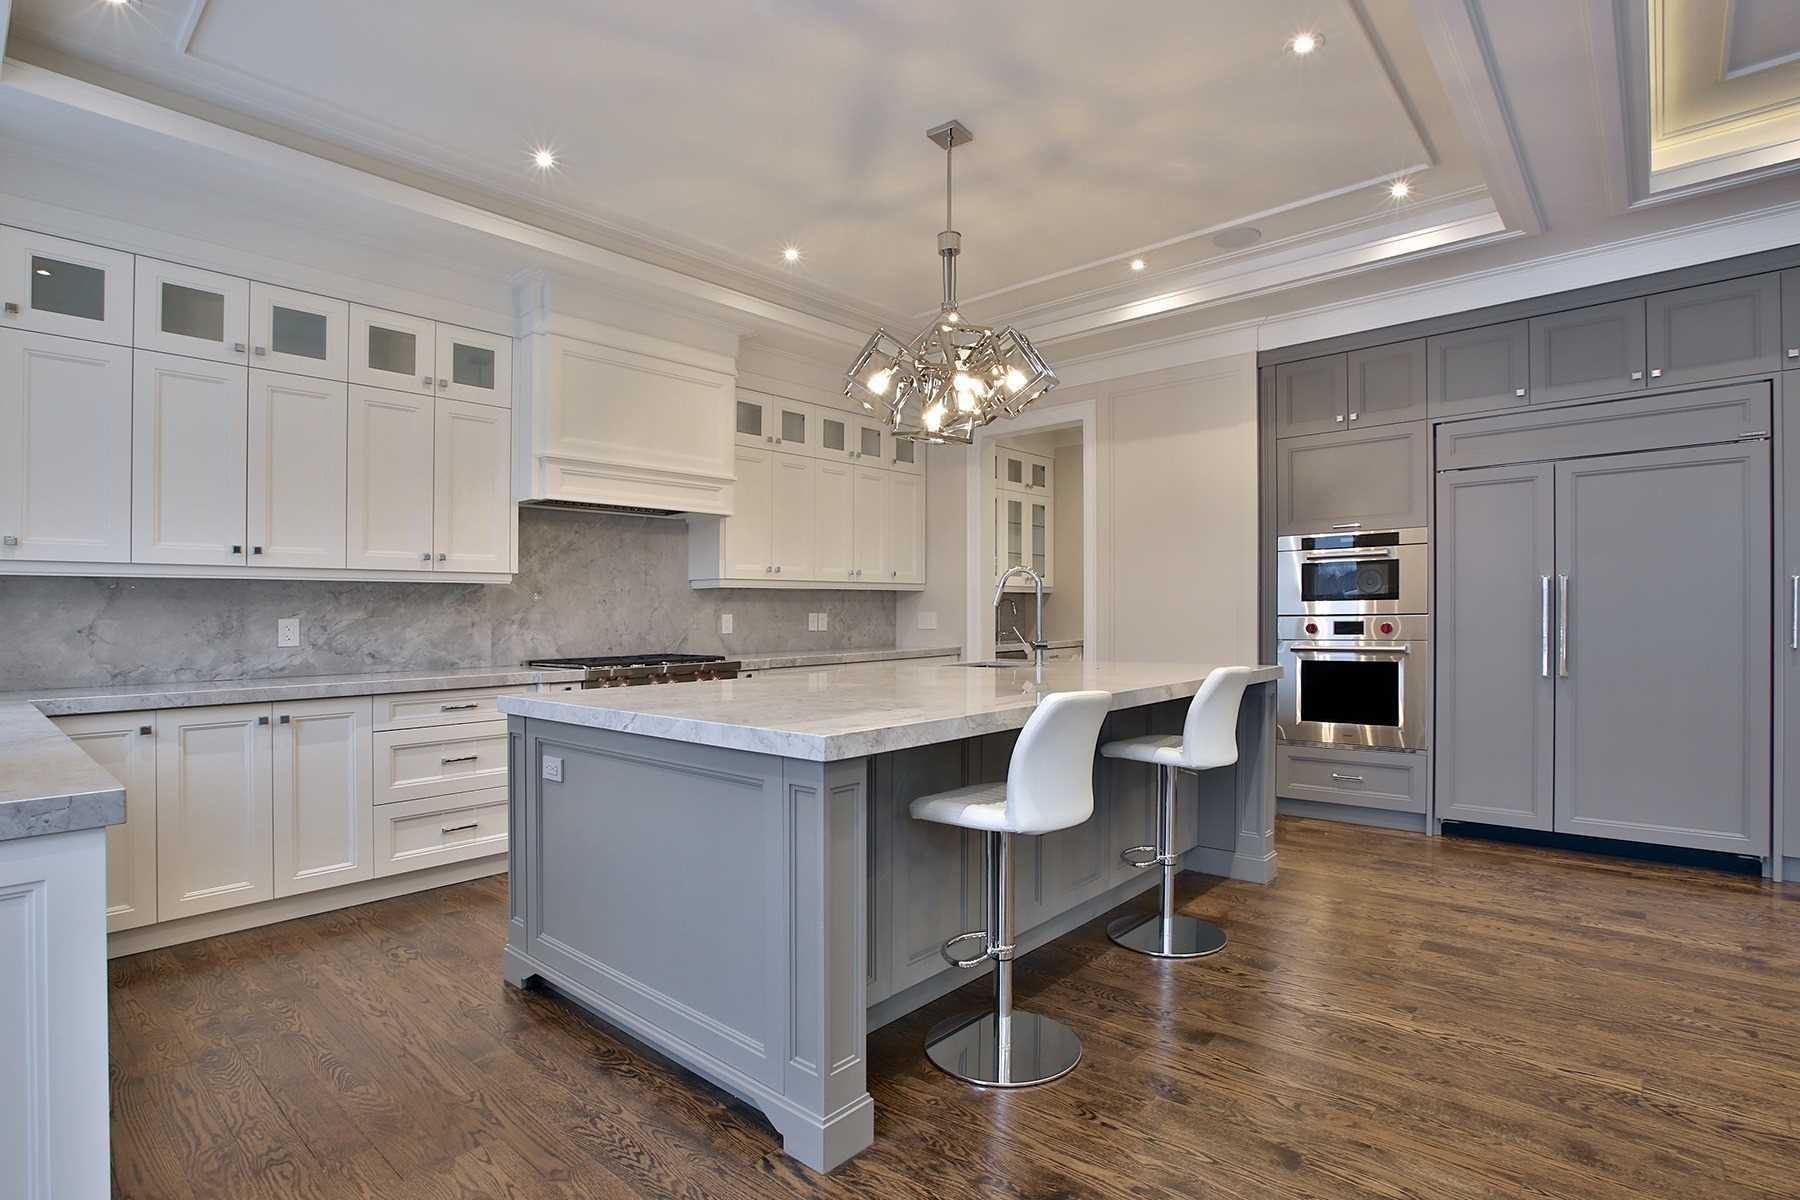 365 Hillcrest Ave, Toronto, Ontario M2N3P9, 4 Bedrooms Bedrooms, 10 Rooms Rooms,7 BathroomsBathrooms,Detached,For Sale,Hillcrest,C4850859